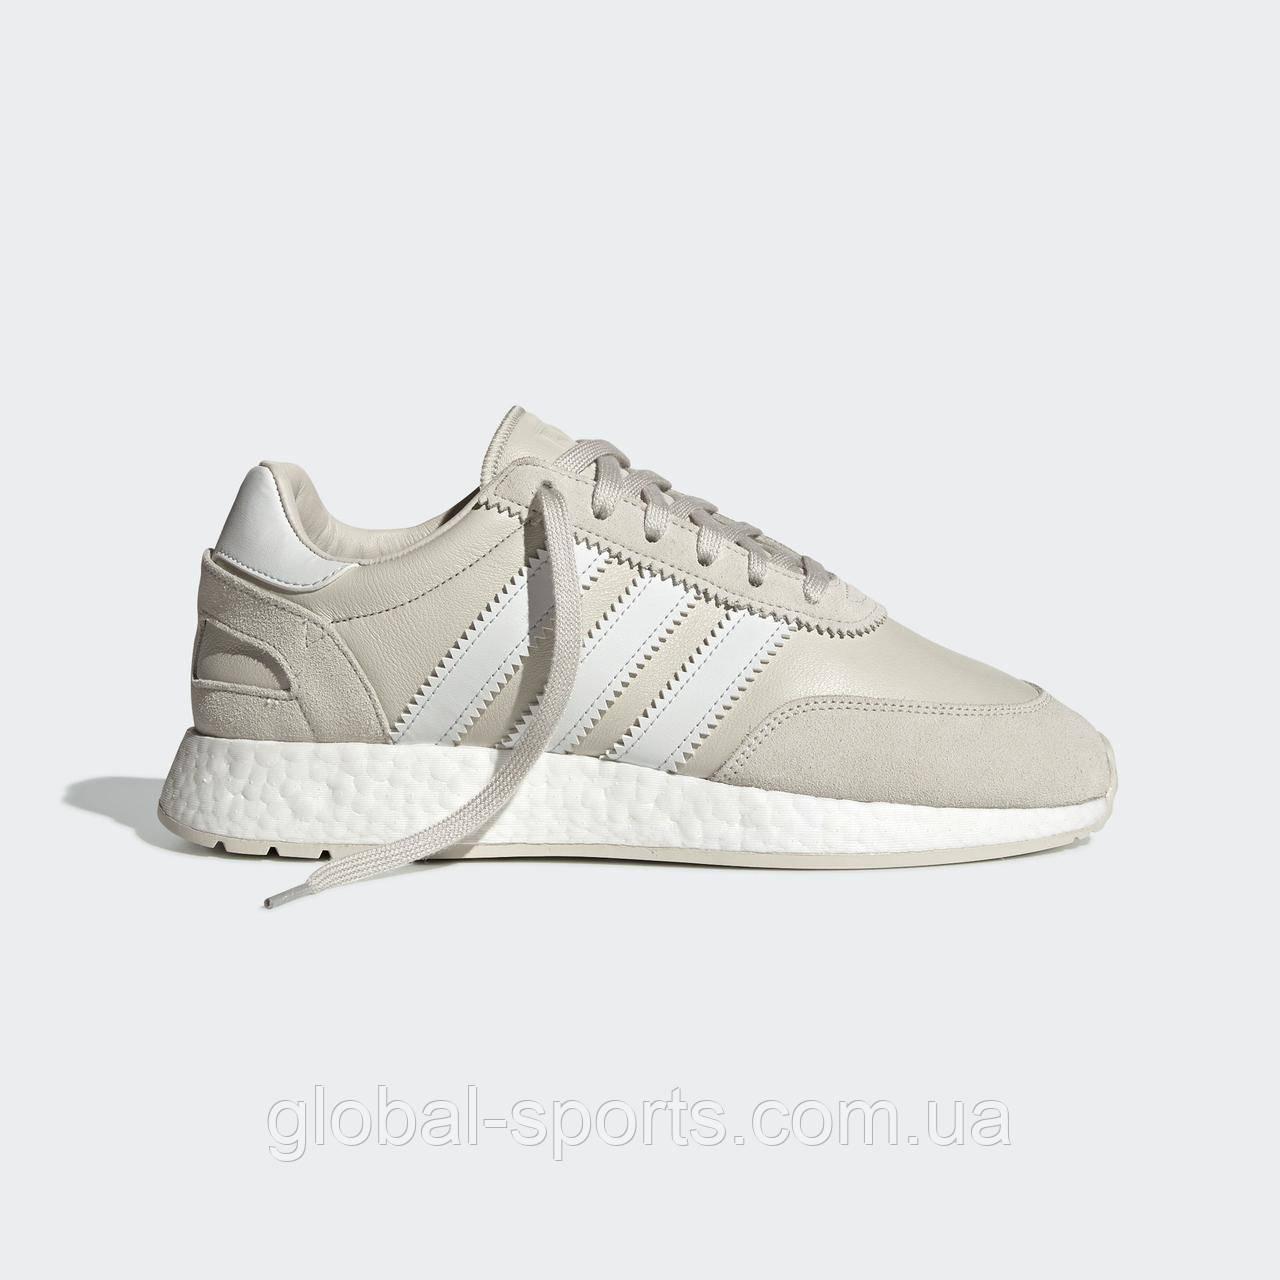 Мужские кроссовки Adidas I-5923(Артикул:BD7799)